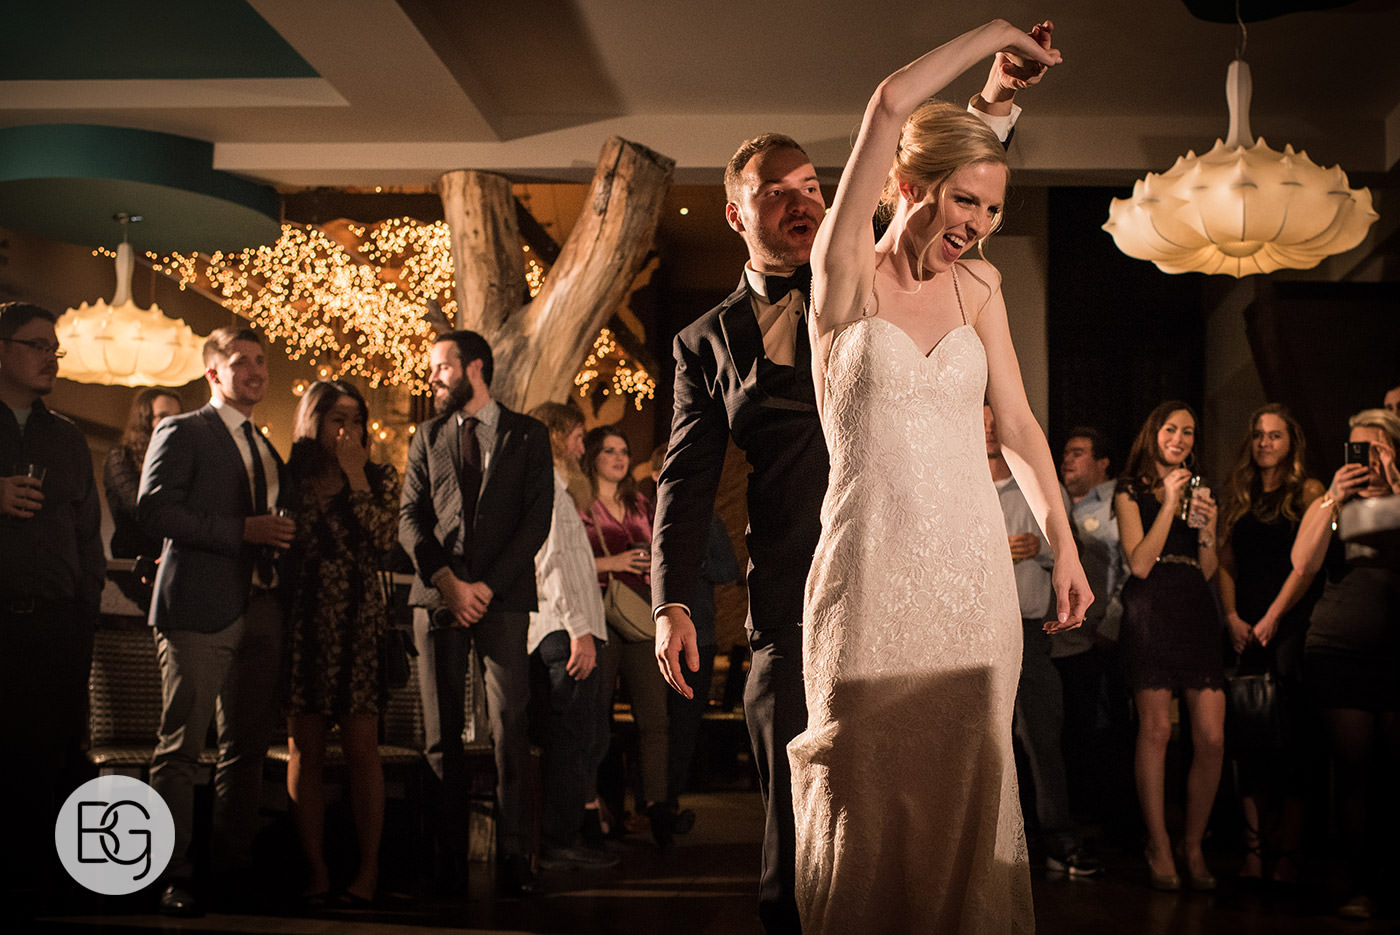 Edmonton_wedding_photographers_josh_sara_whyte_45.jpg